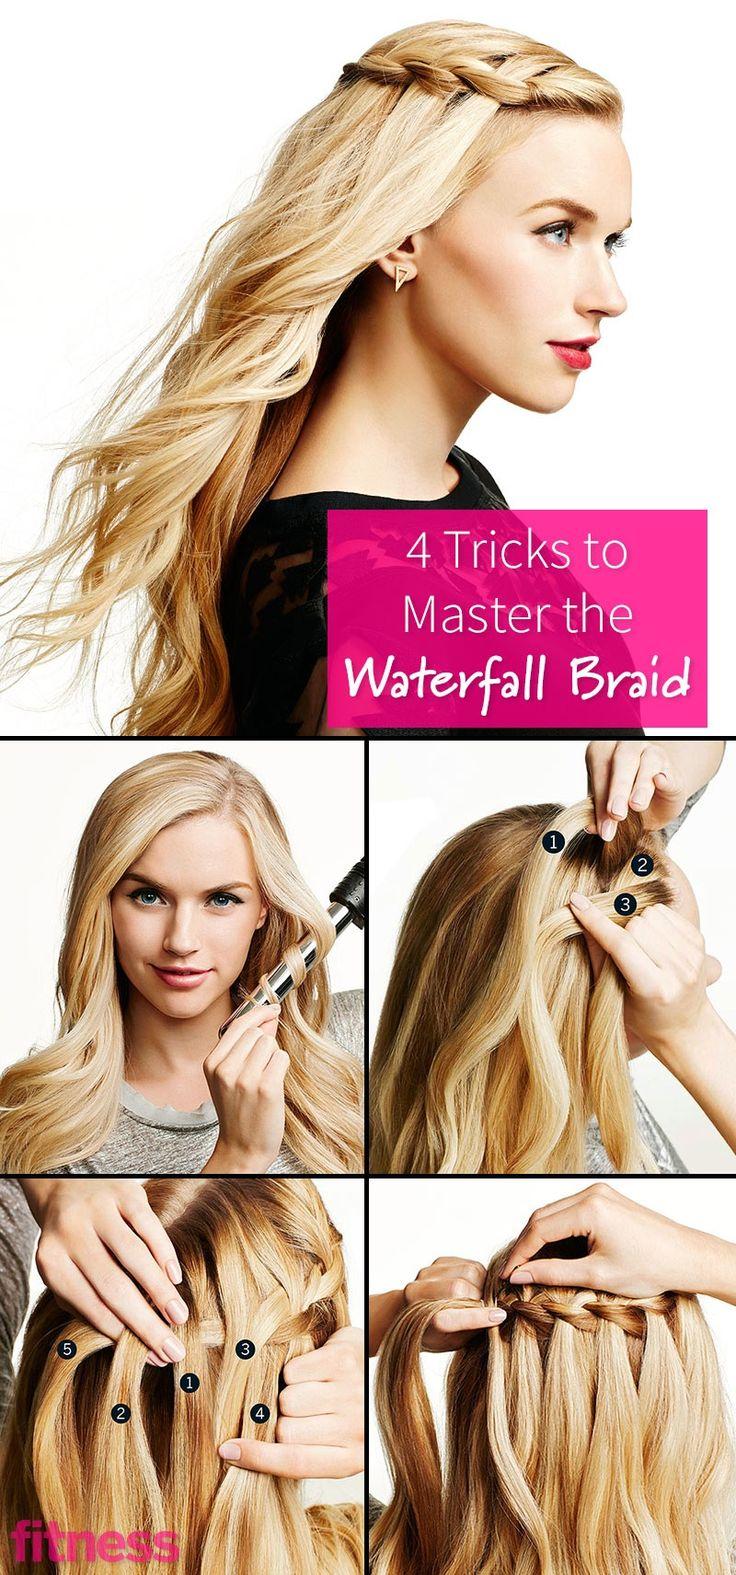 A Step-By-Step Waterfall Braid Tutorial